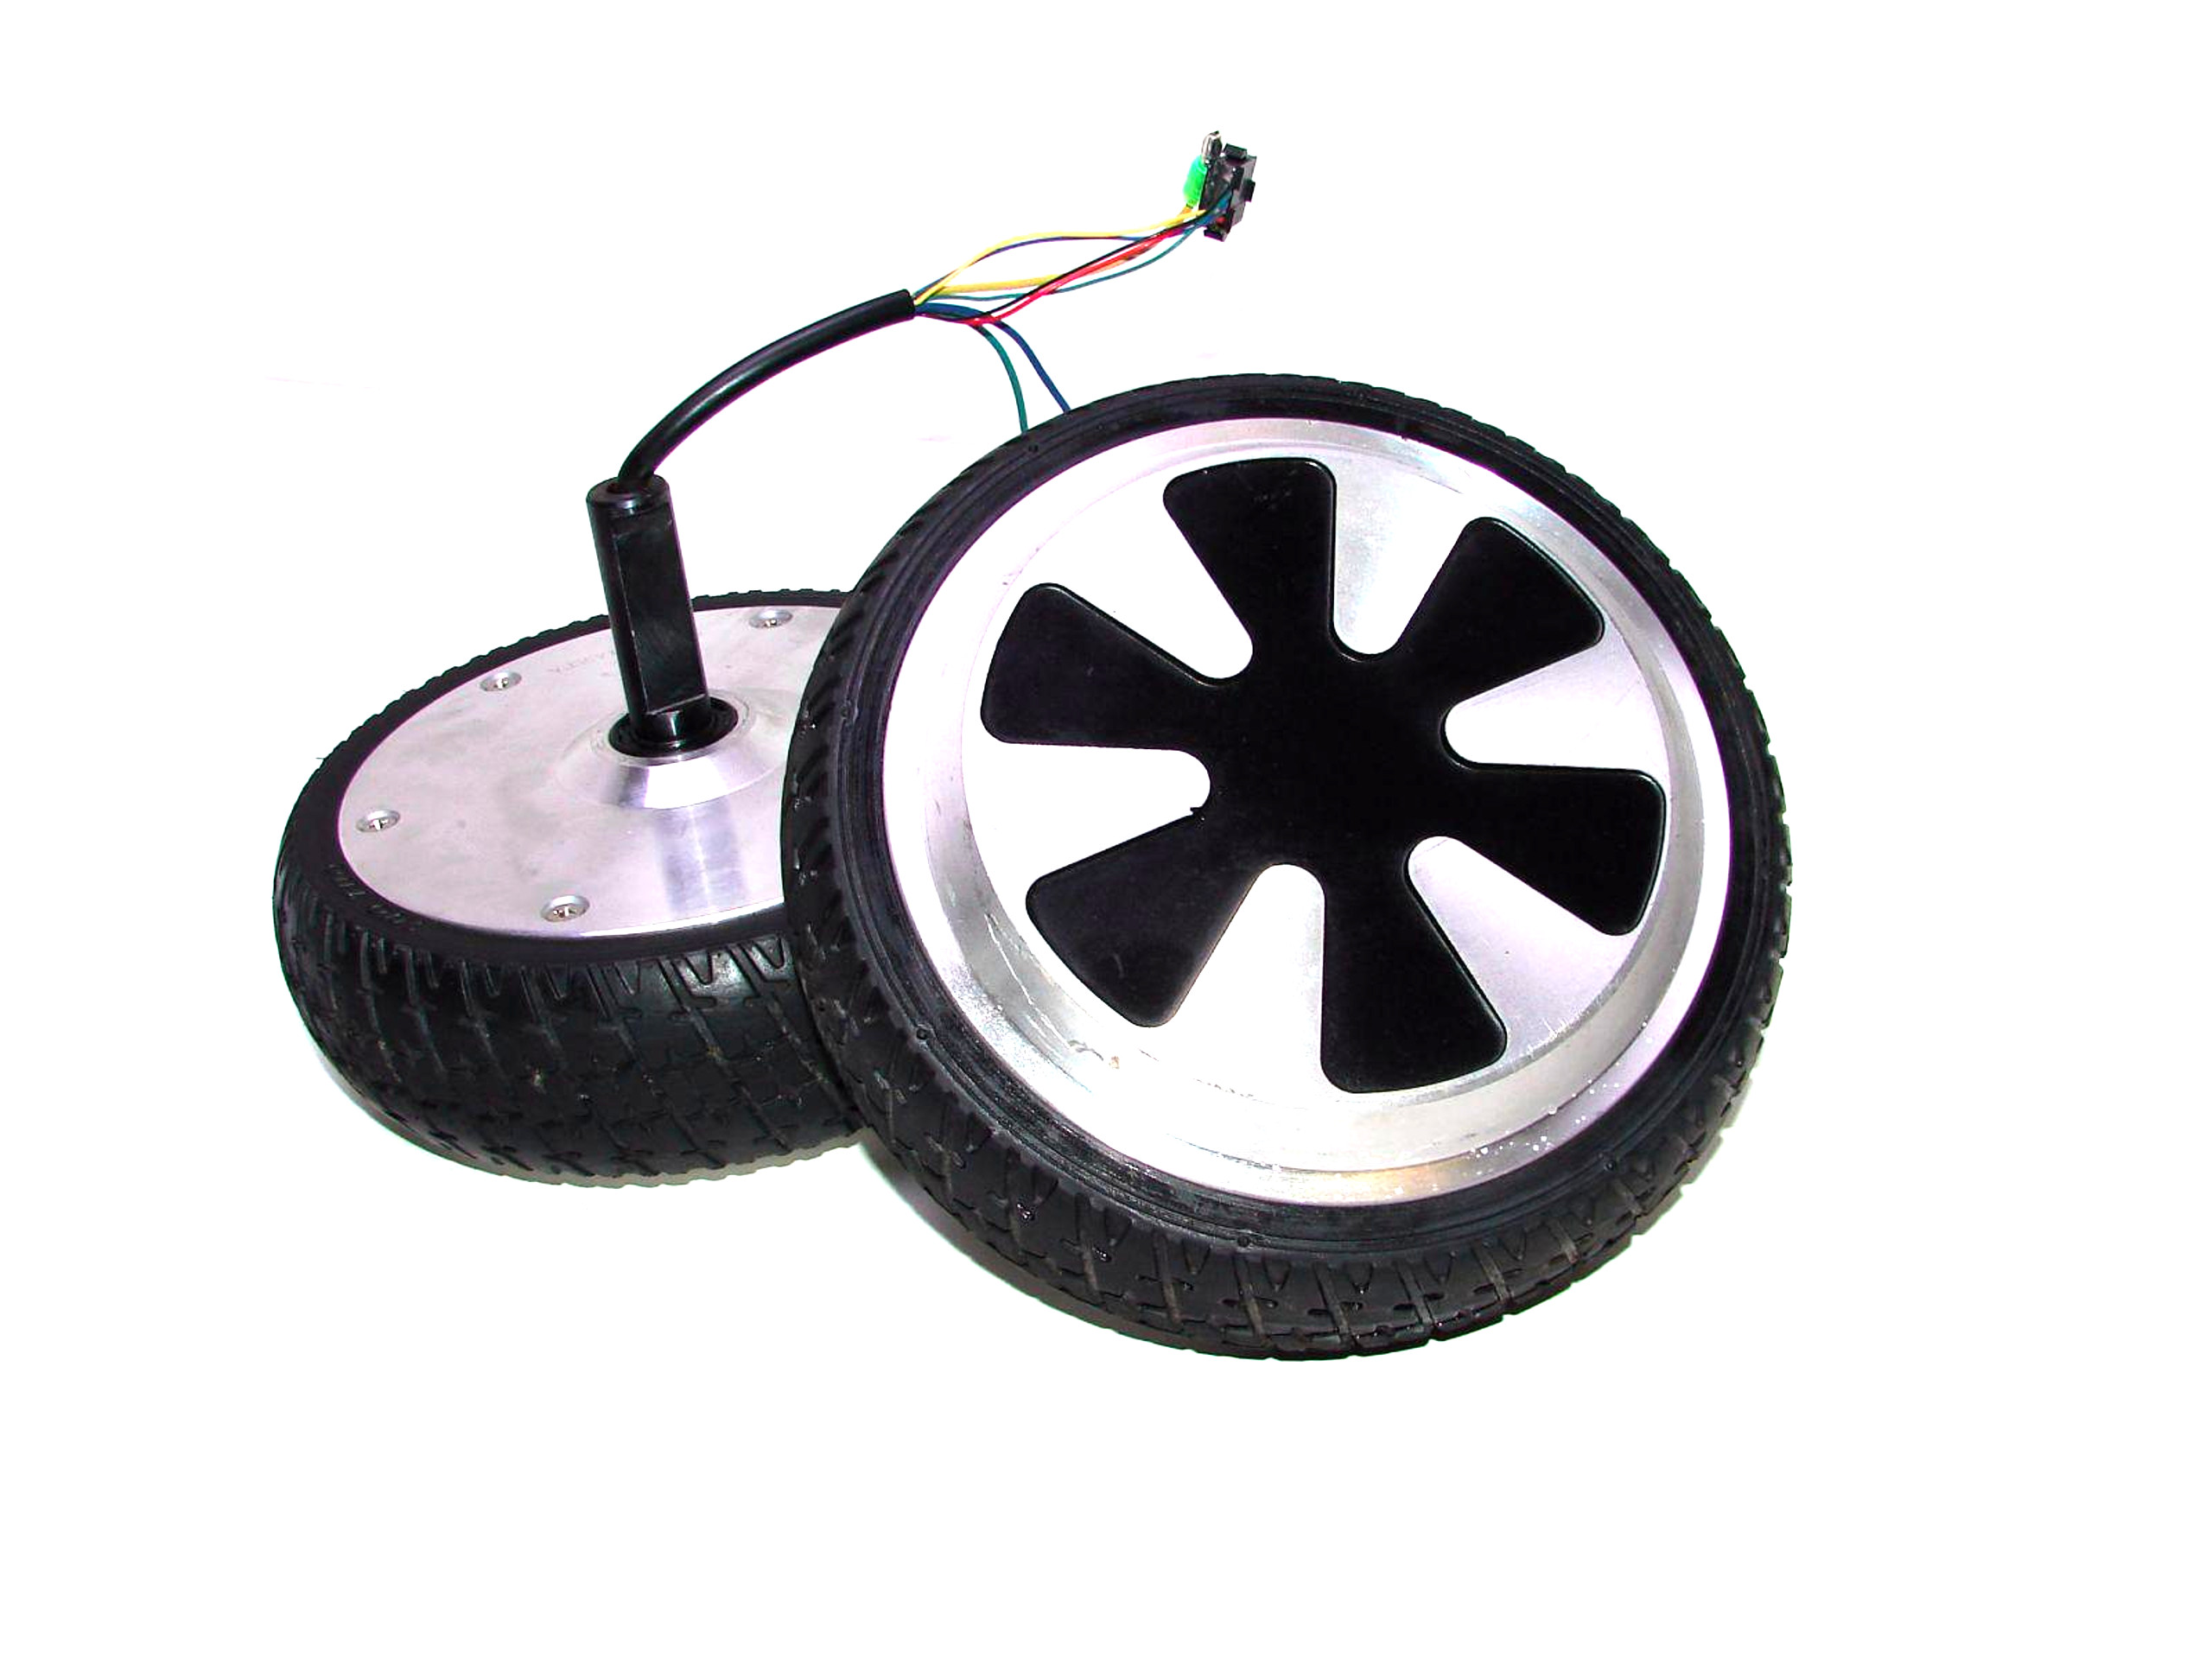 2x Koło silnik do Hoverboard Mini-Segway